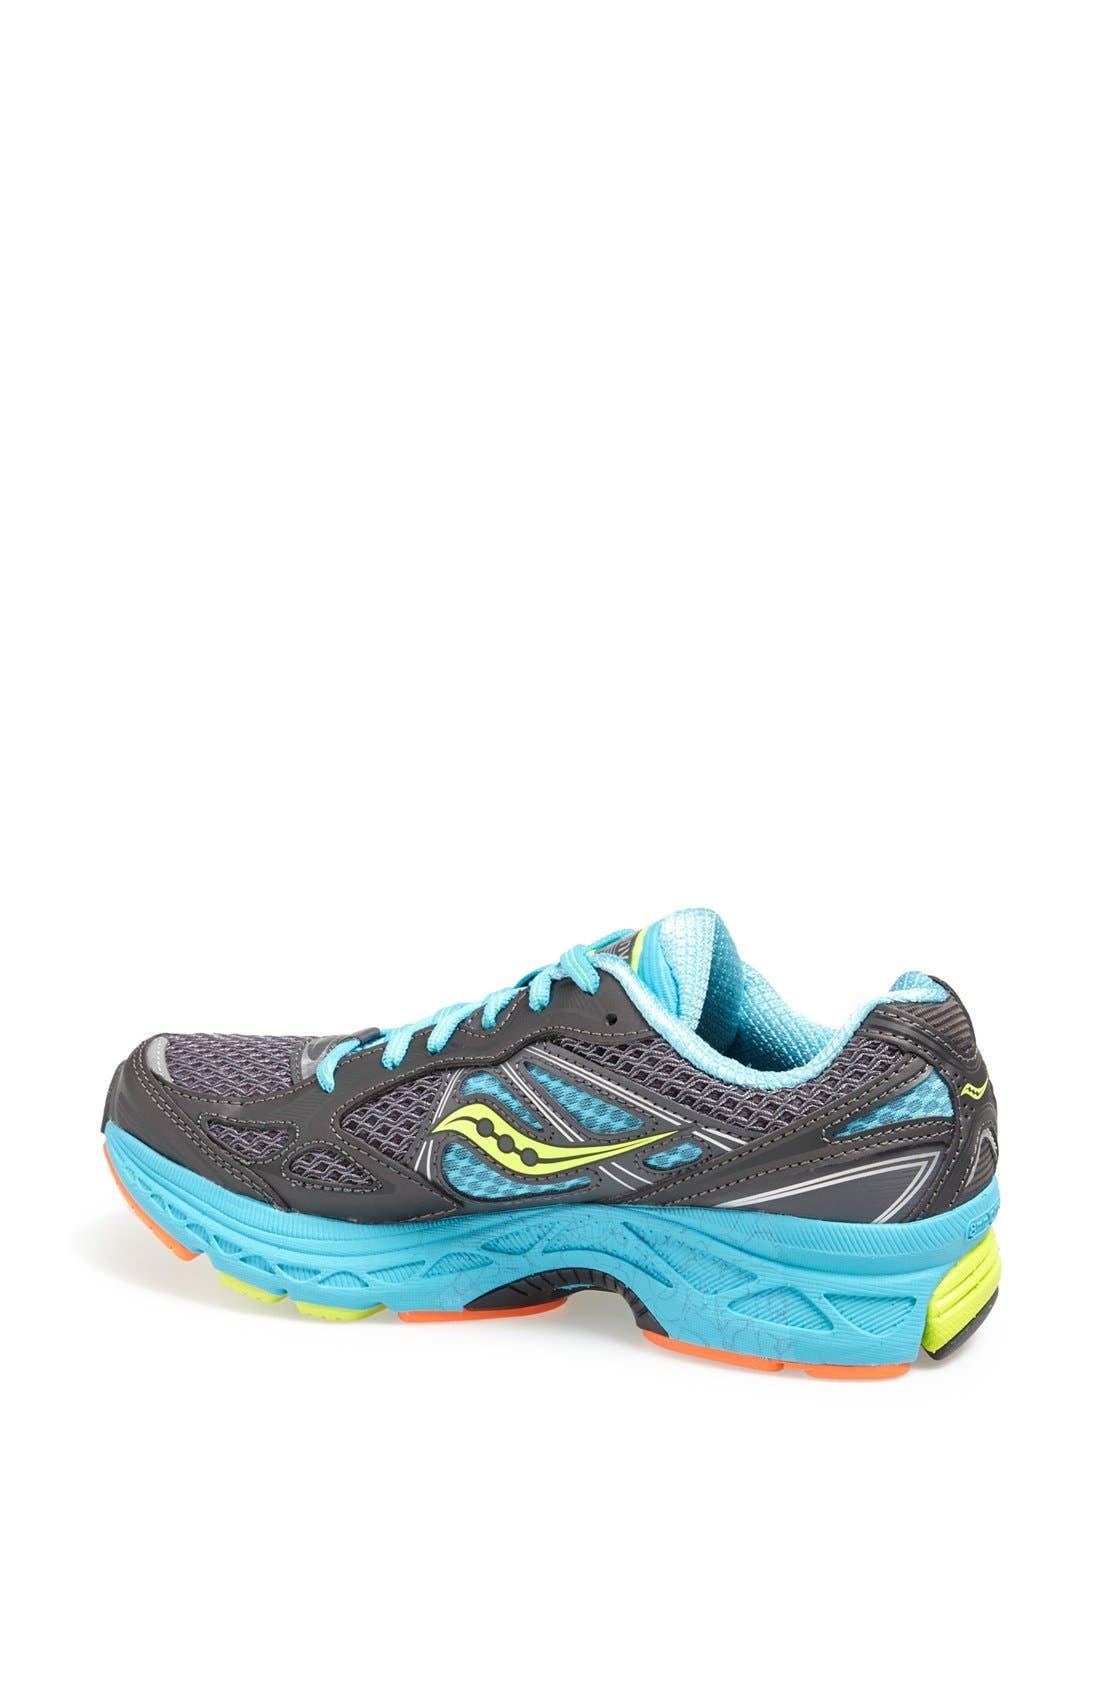 Alternate Image 2  - Saucony 'Guide 7' Running Shoe (Women)